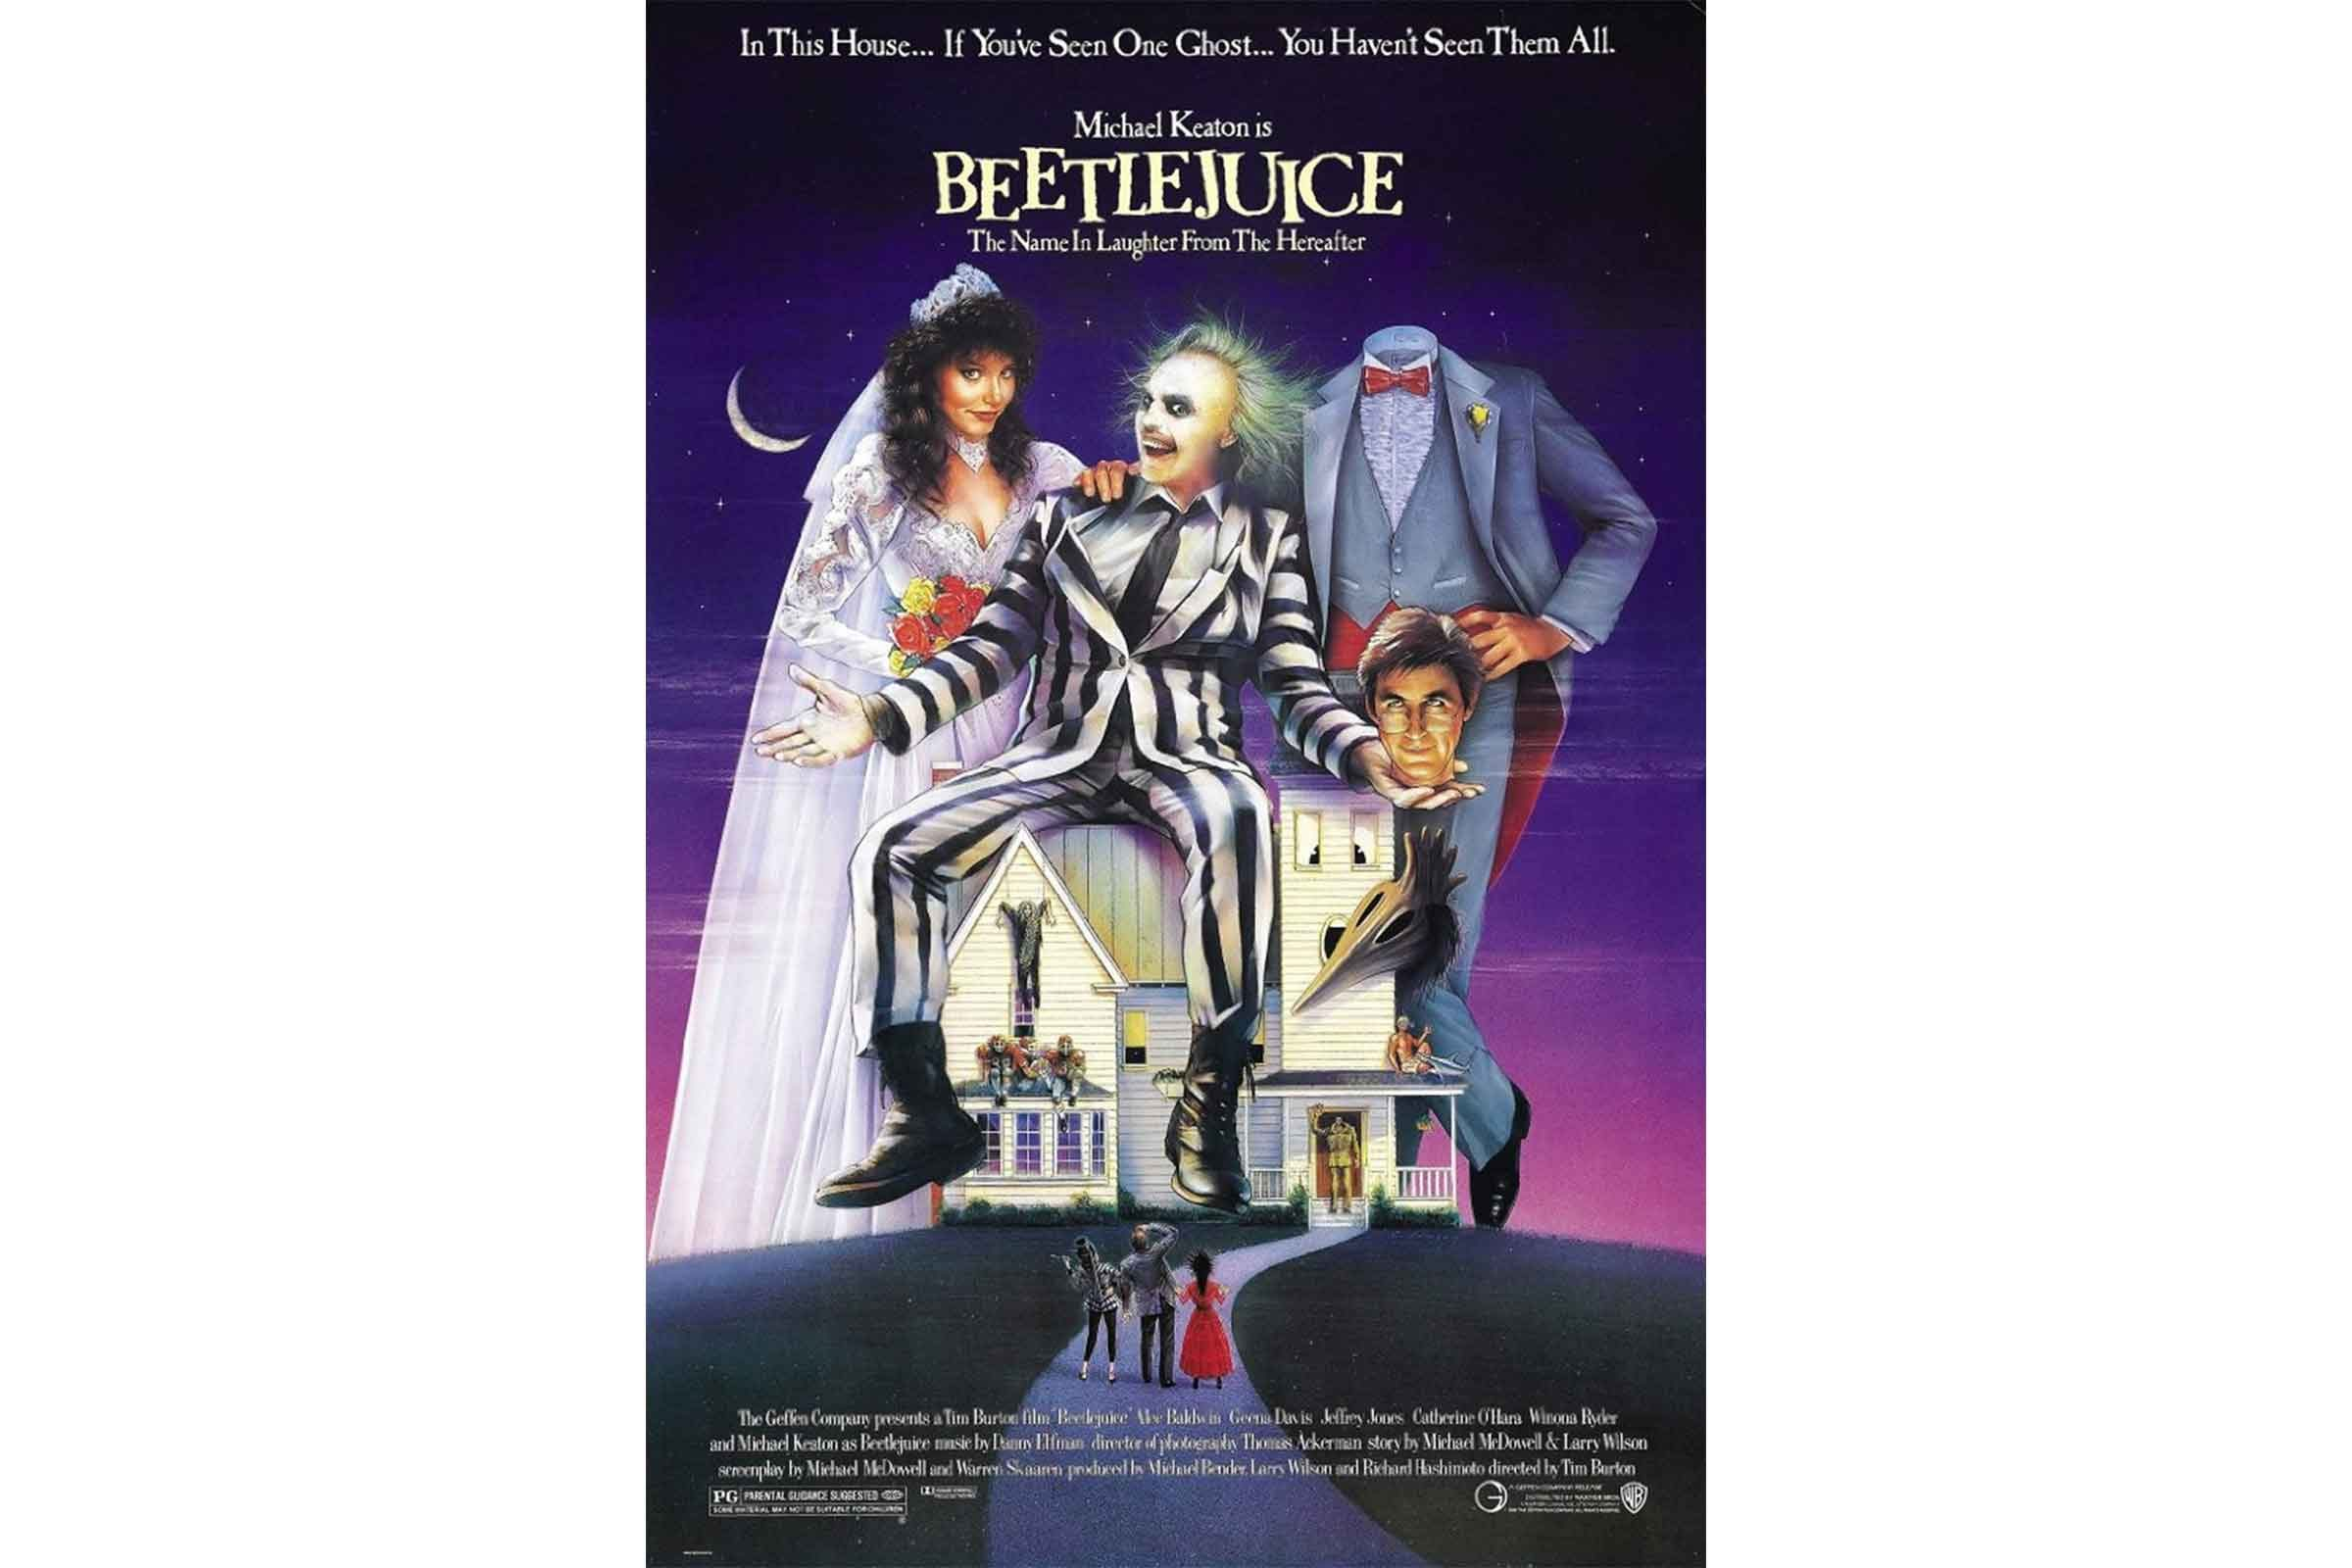 kids halloween movies: best halloween movies for kids | reader's digest